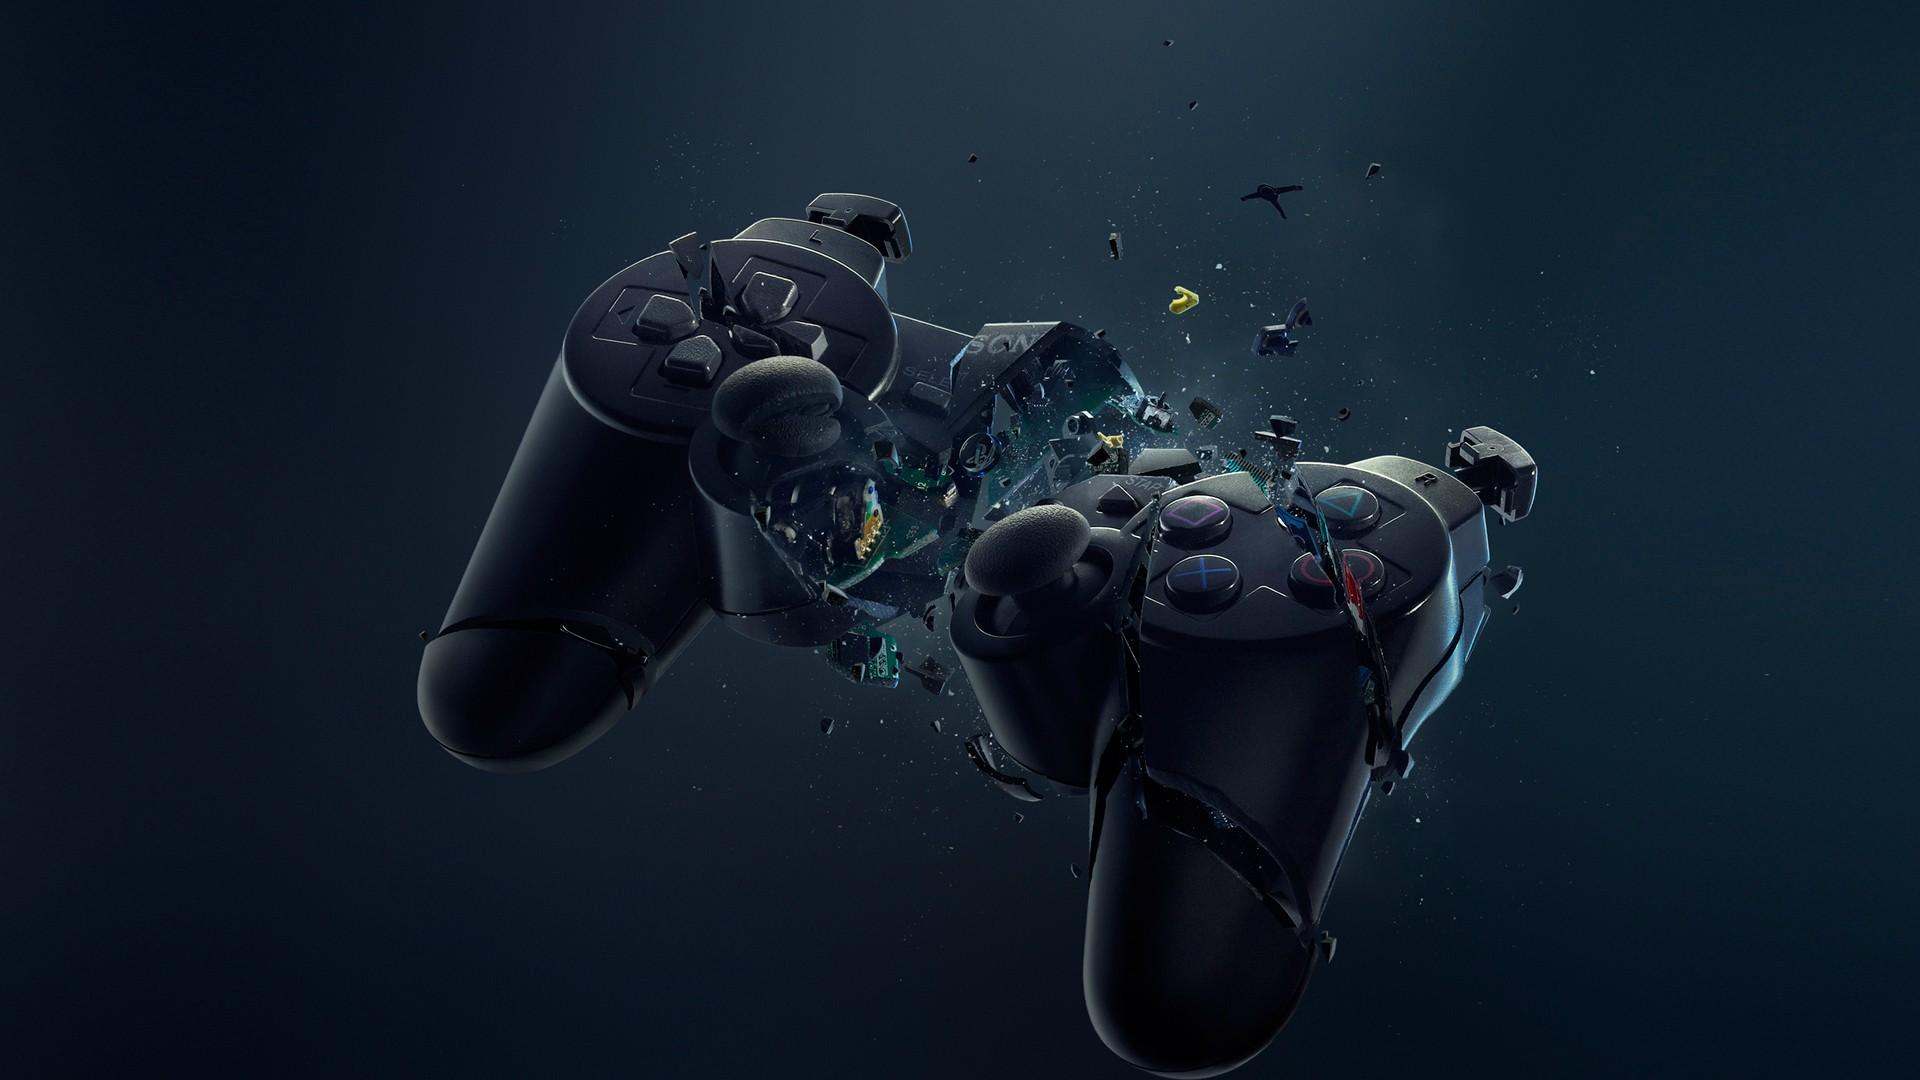 Funniest Xbox Gamerpics 1080x1080